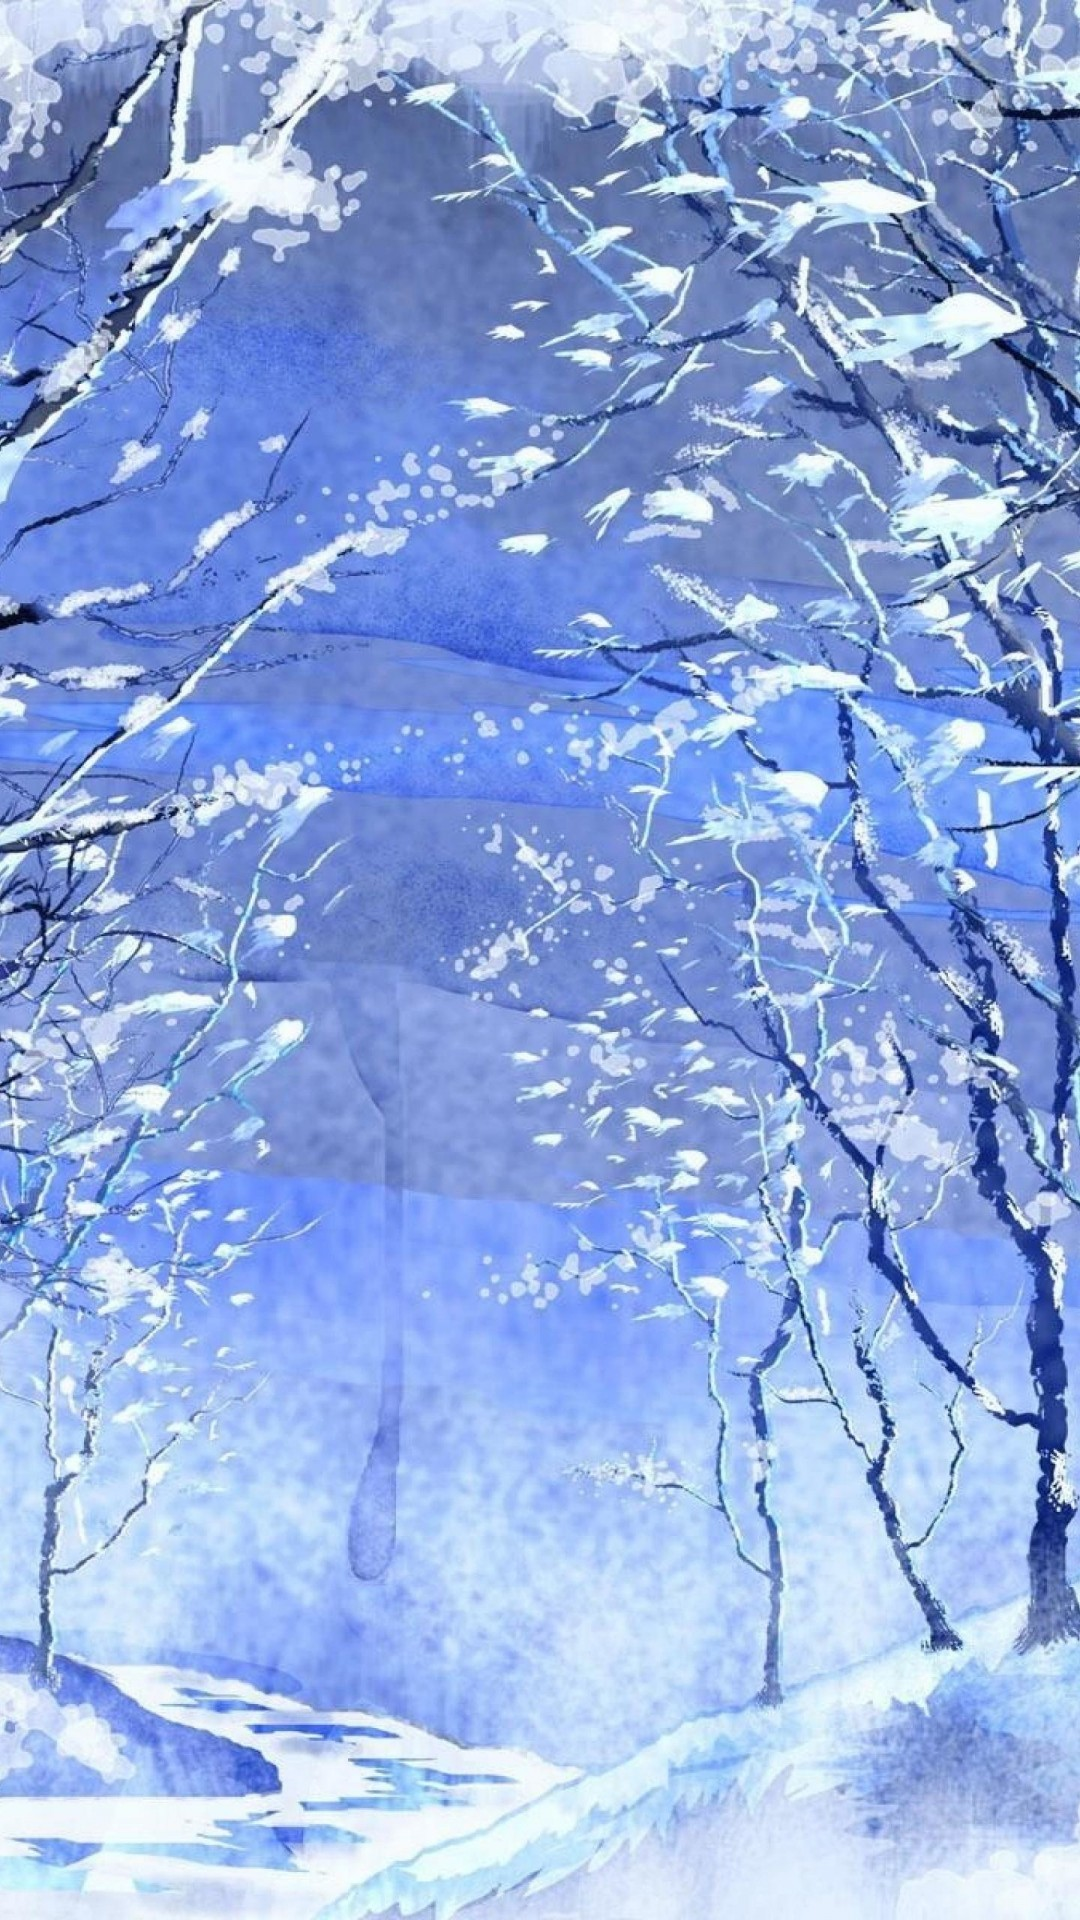 Winter Illustration. iPhone 6s Plus. Download 0